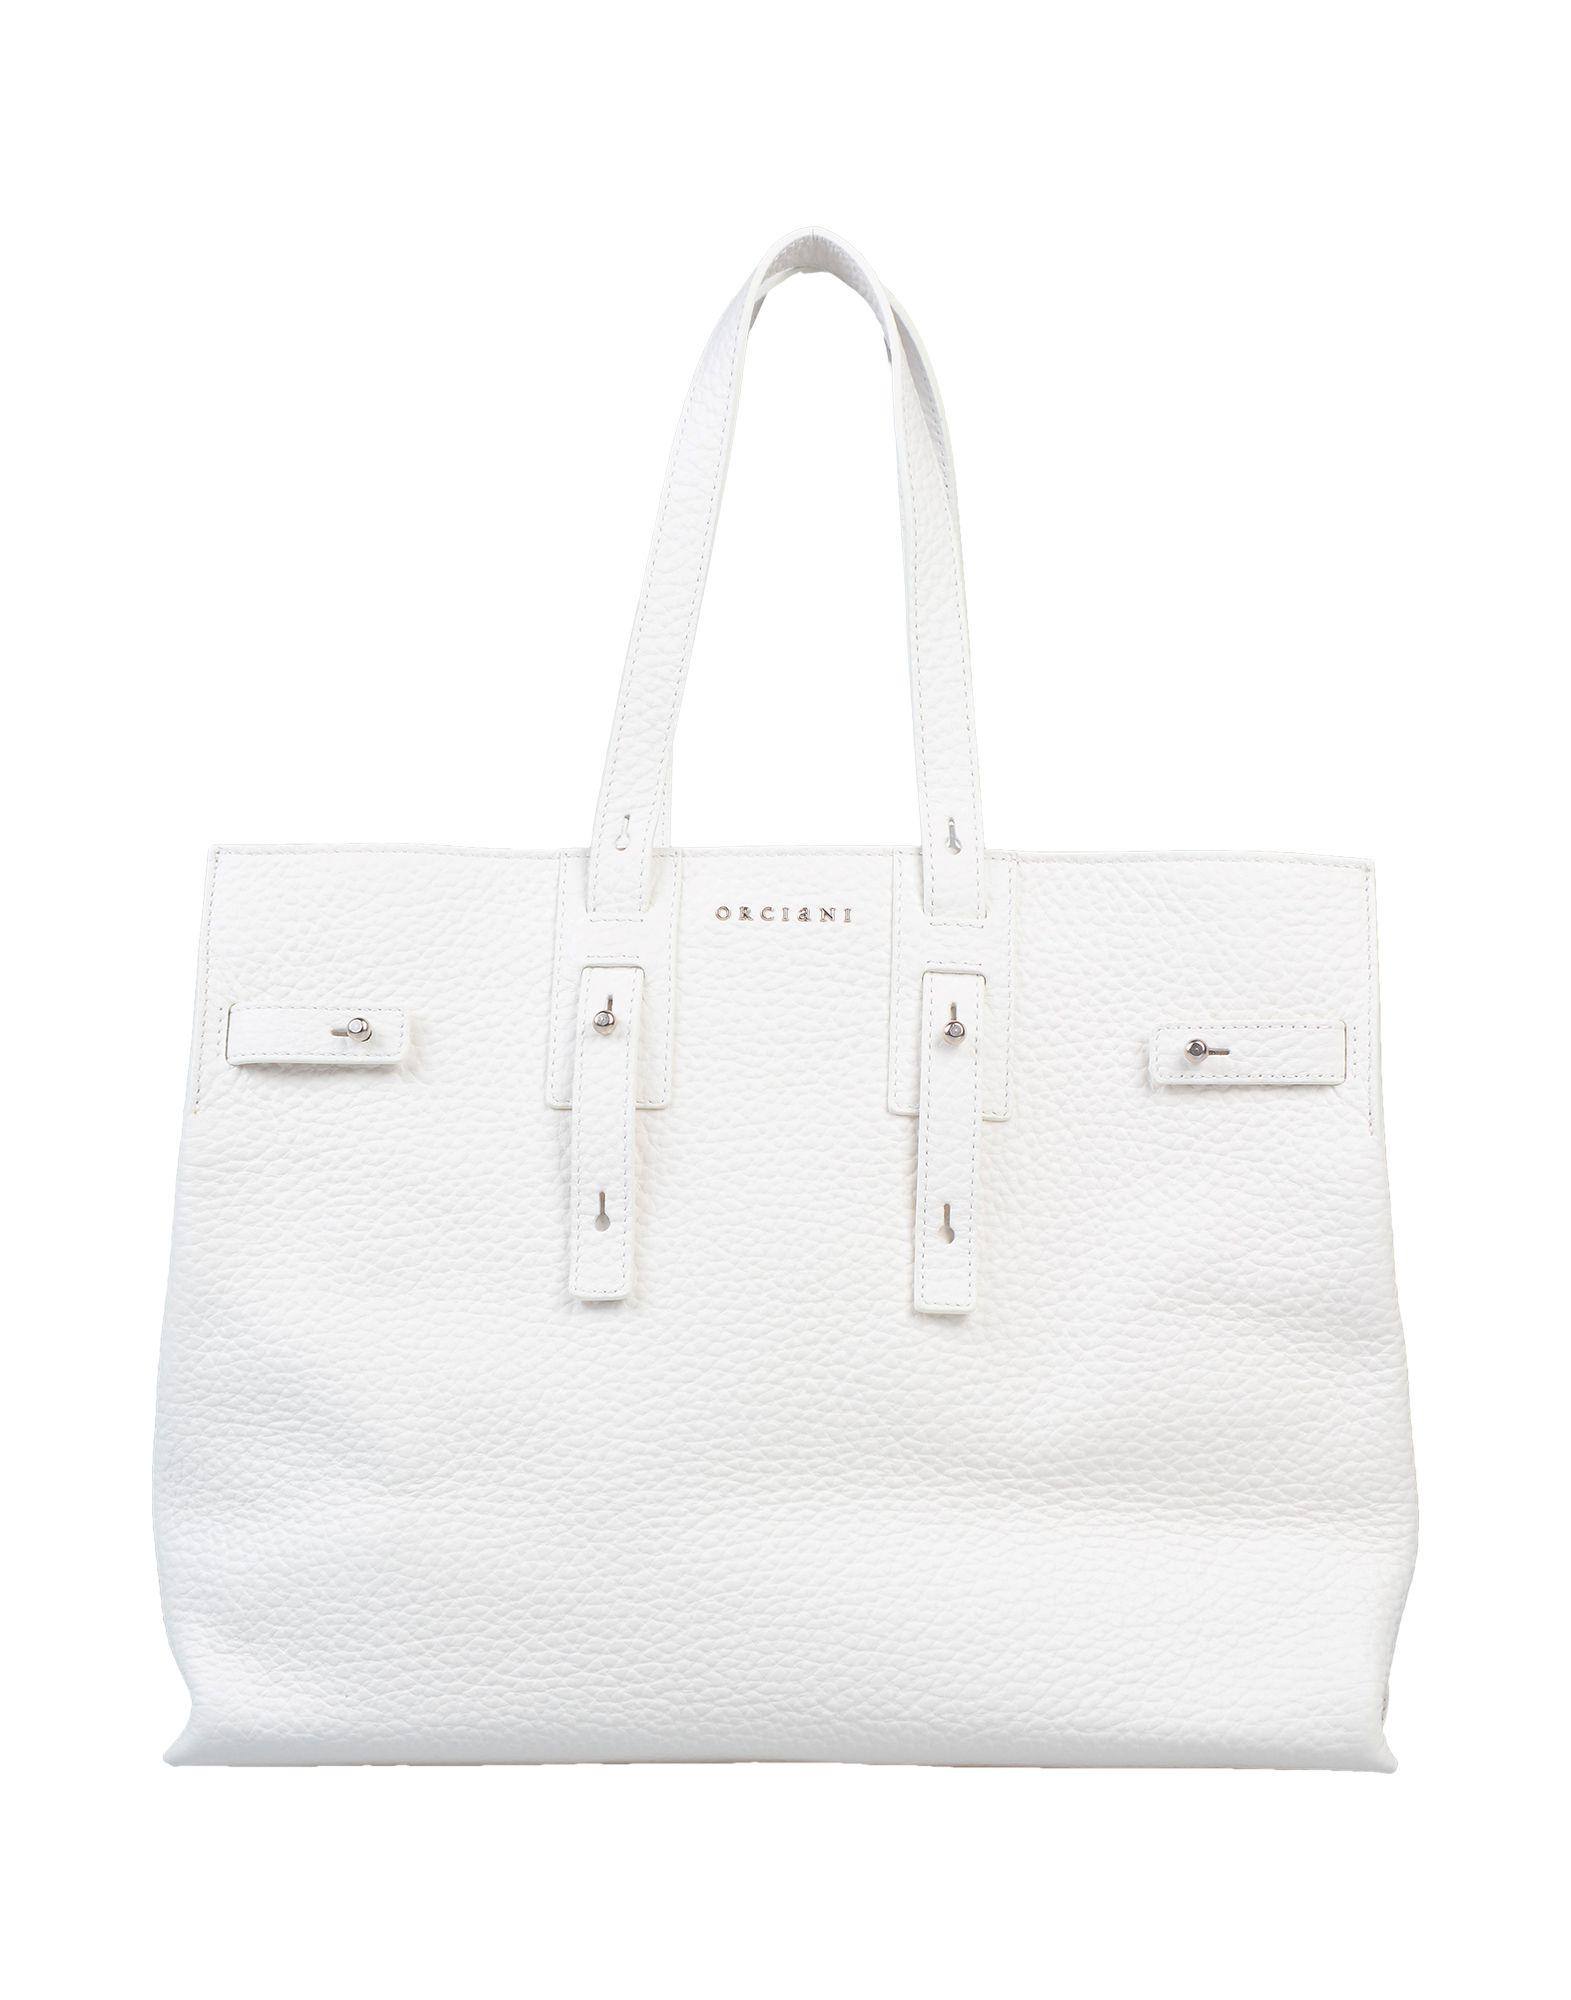 Orciani Handbag